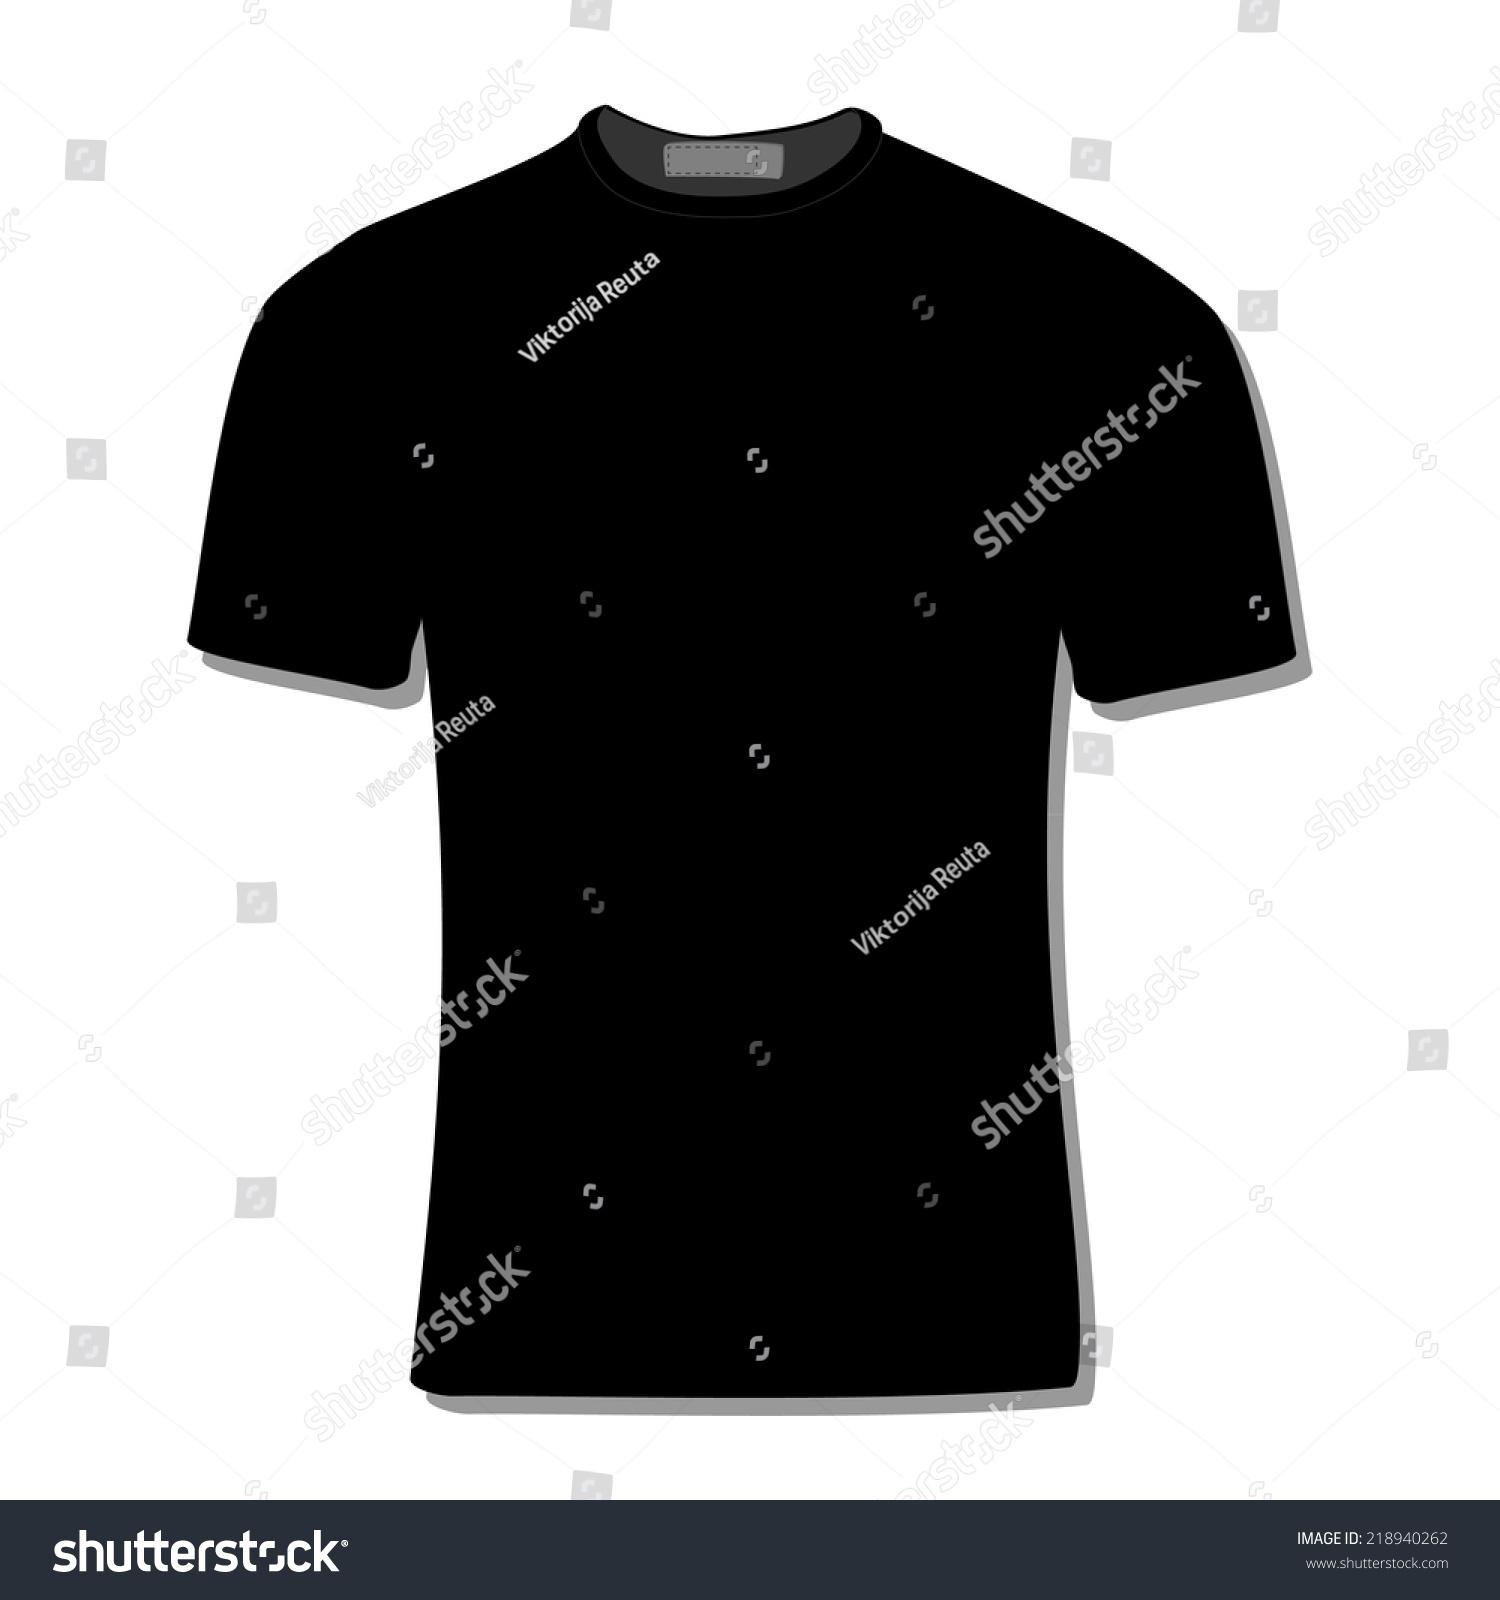 Black t shirt vector - Download